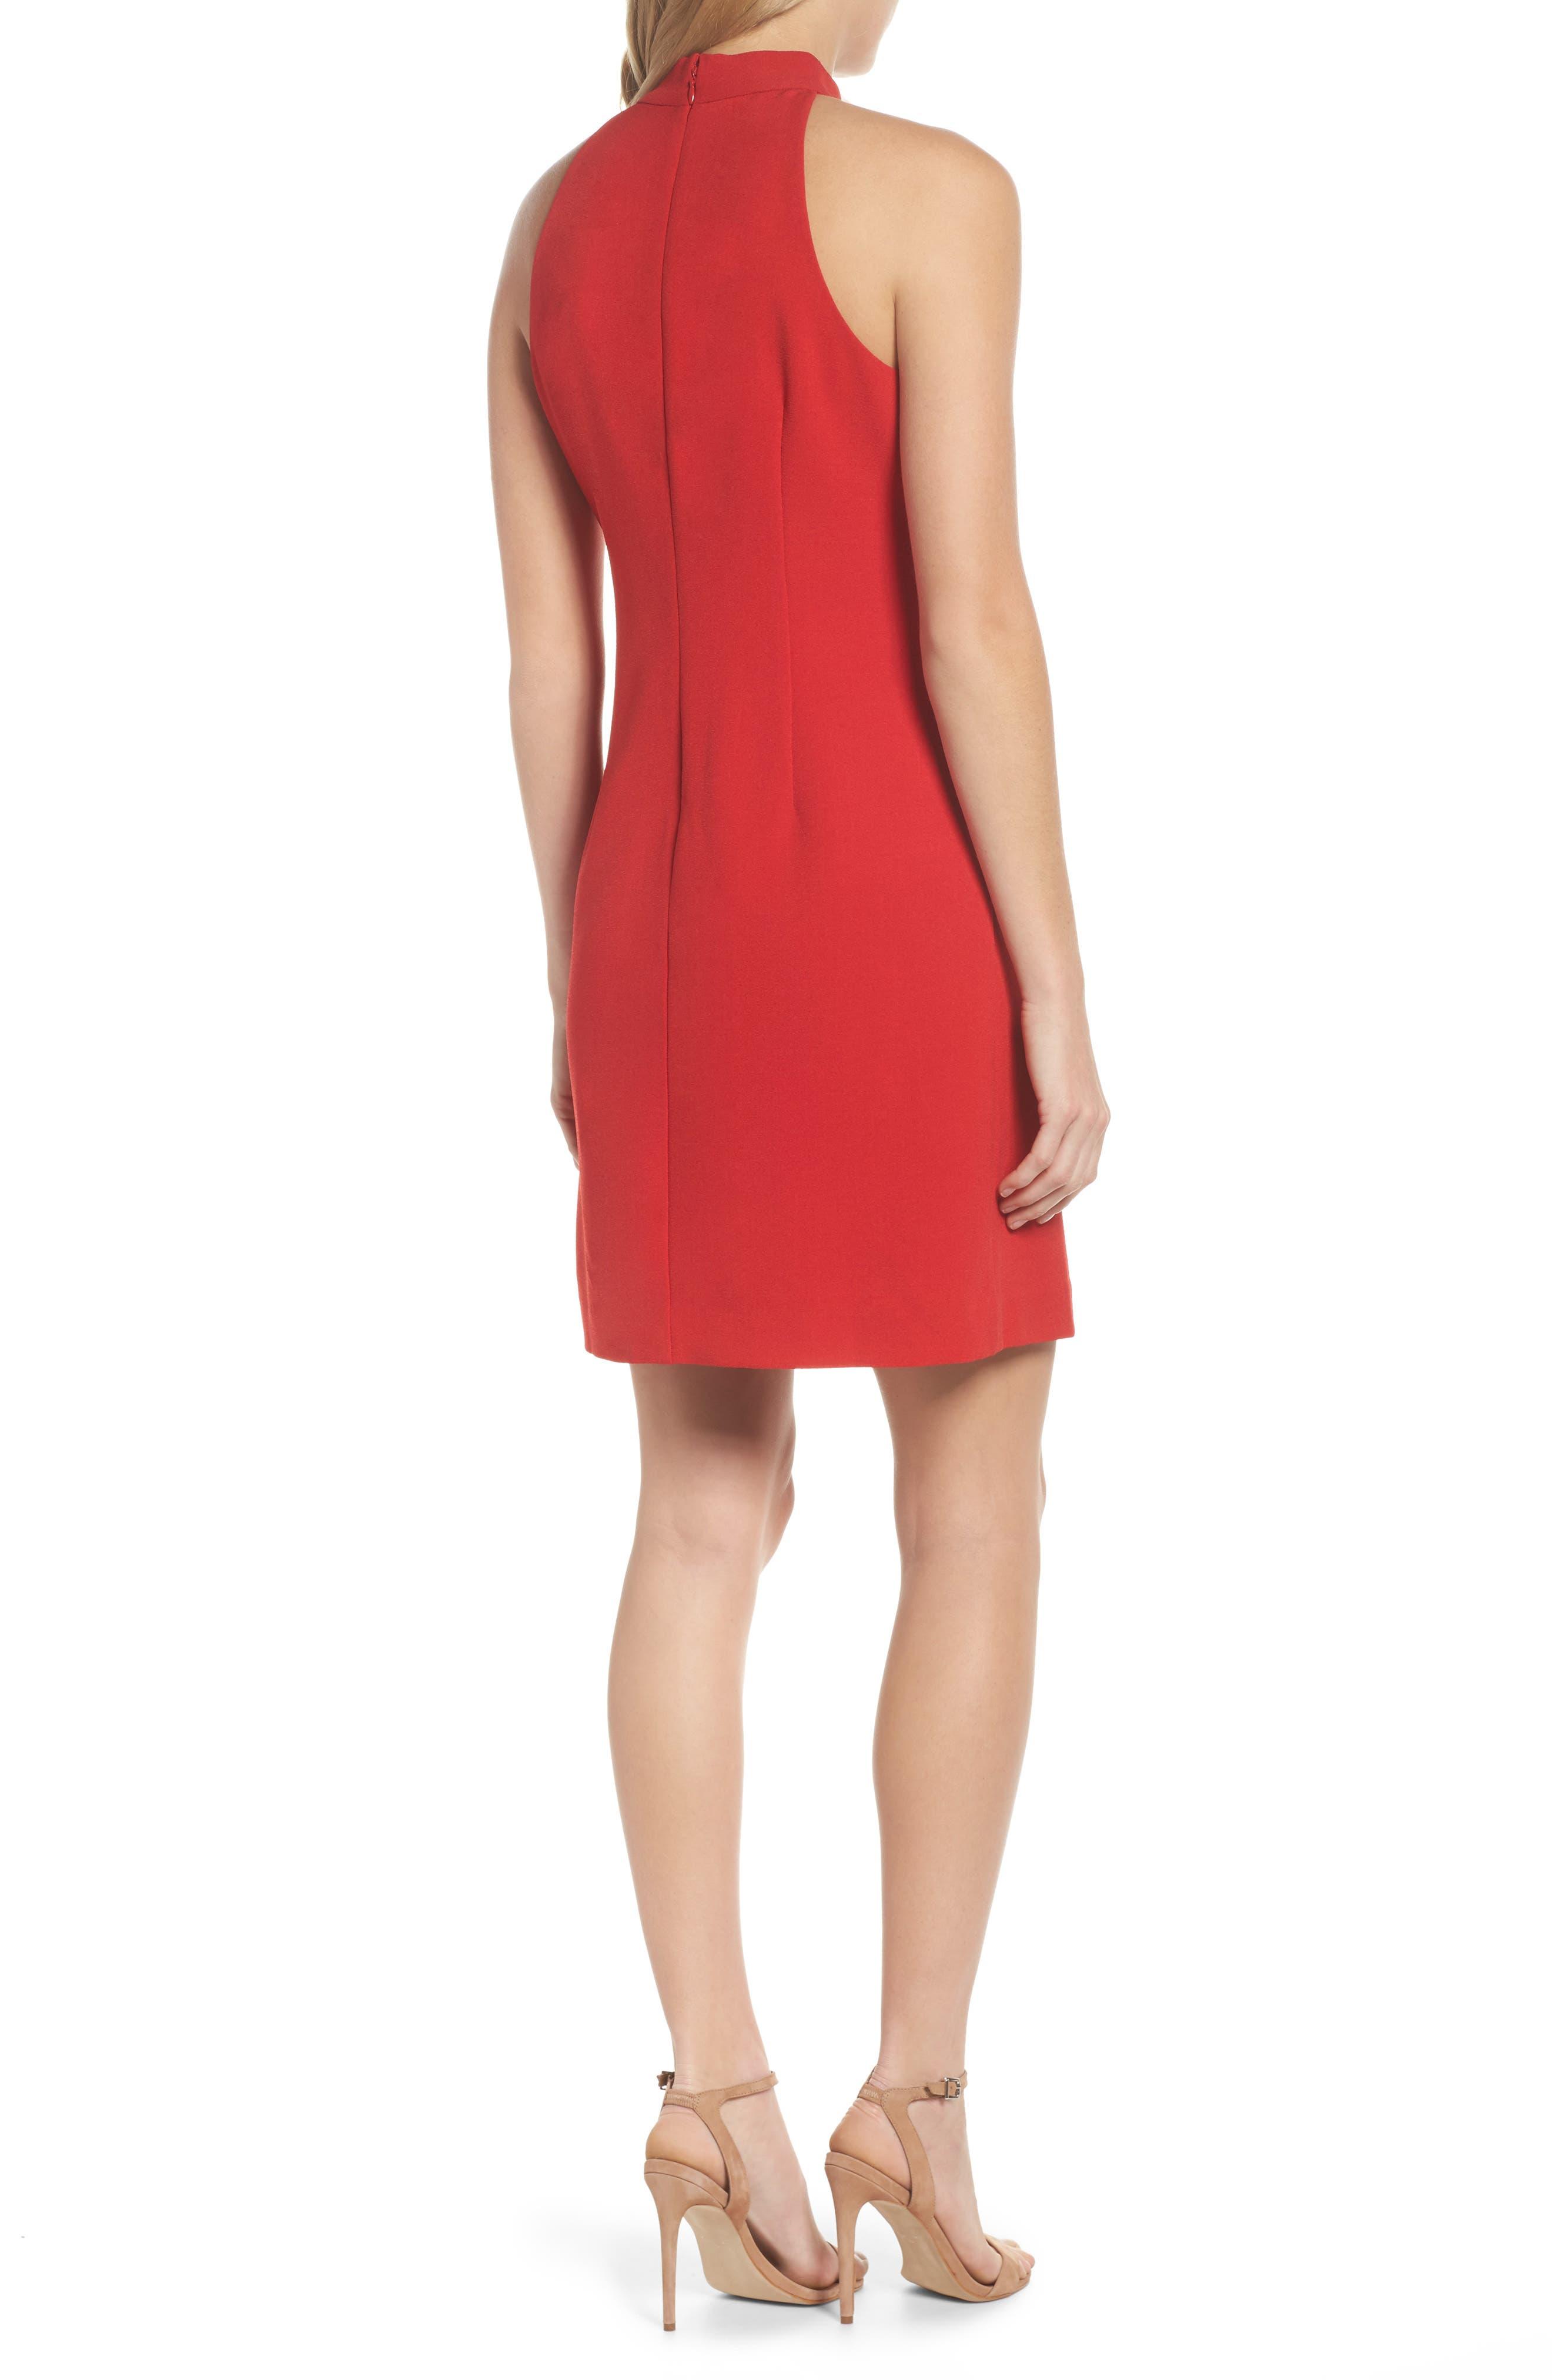 VINCE CAMUTO, Halter Tie Neck A-Line Dress, Alternate thumbnail 2, color, RED